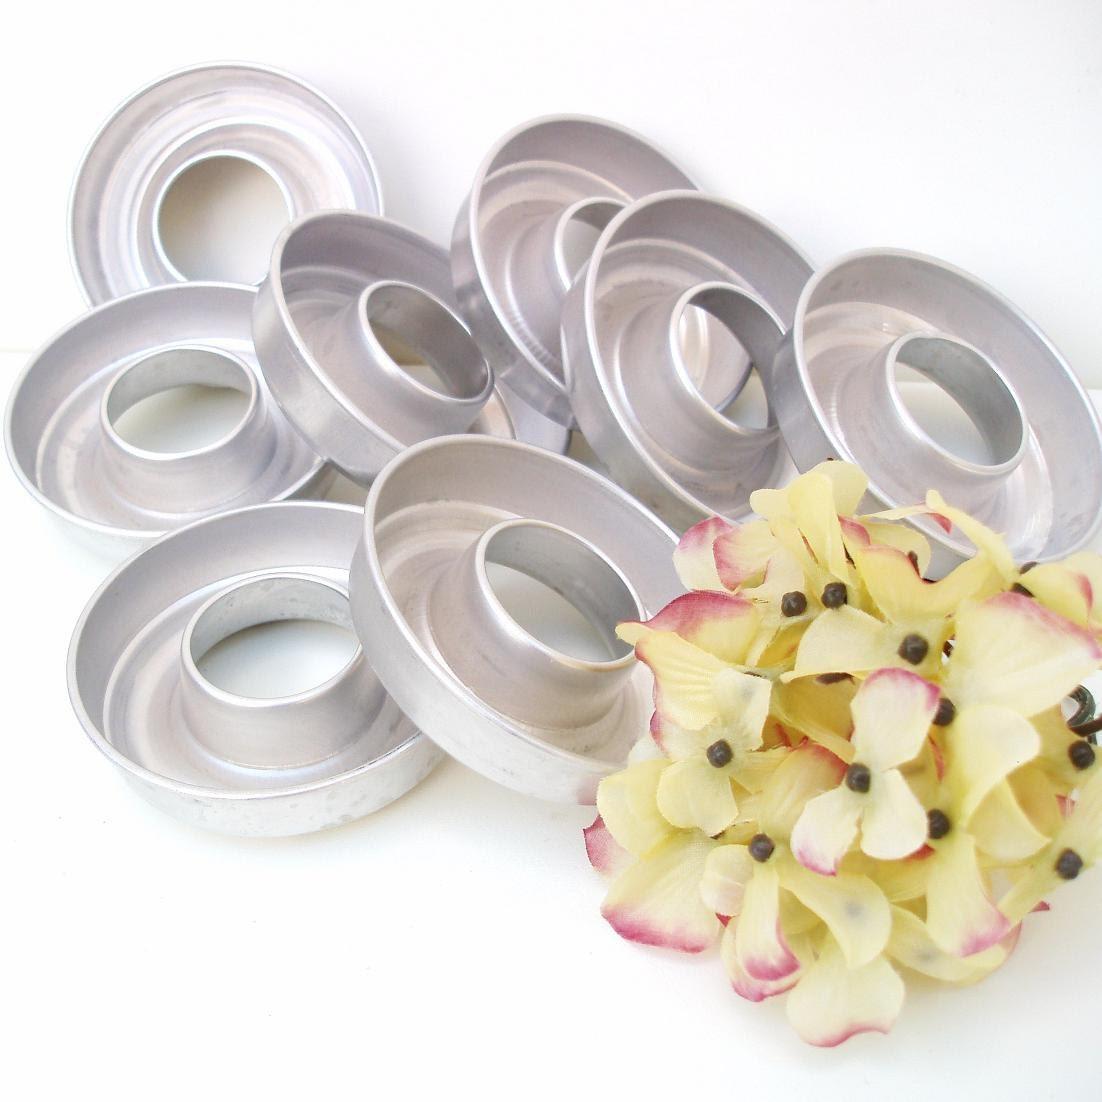 Vintage Mini Bundt Pans Aluminum Jello Molds Metal Baking Tins